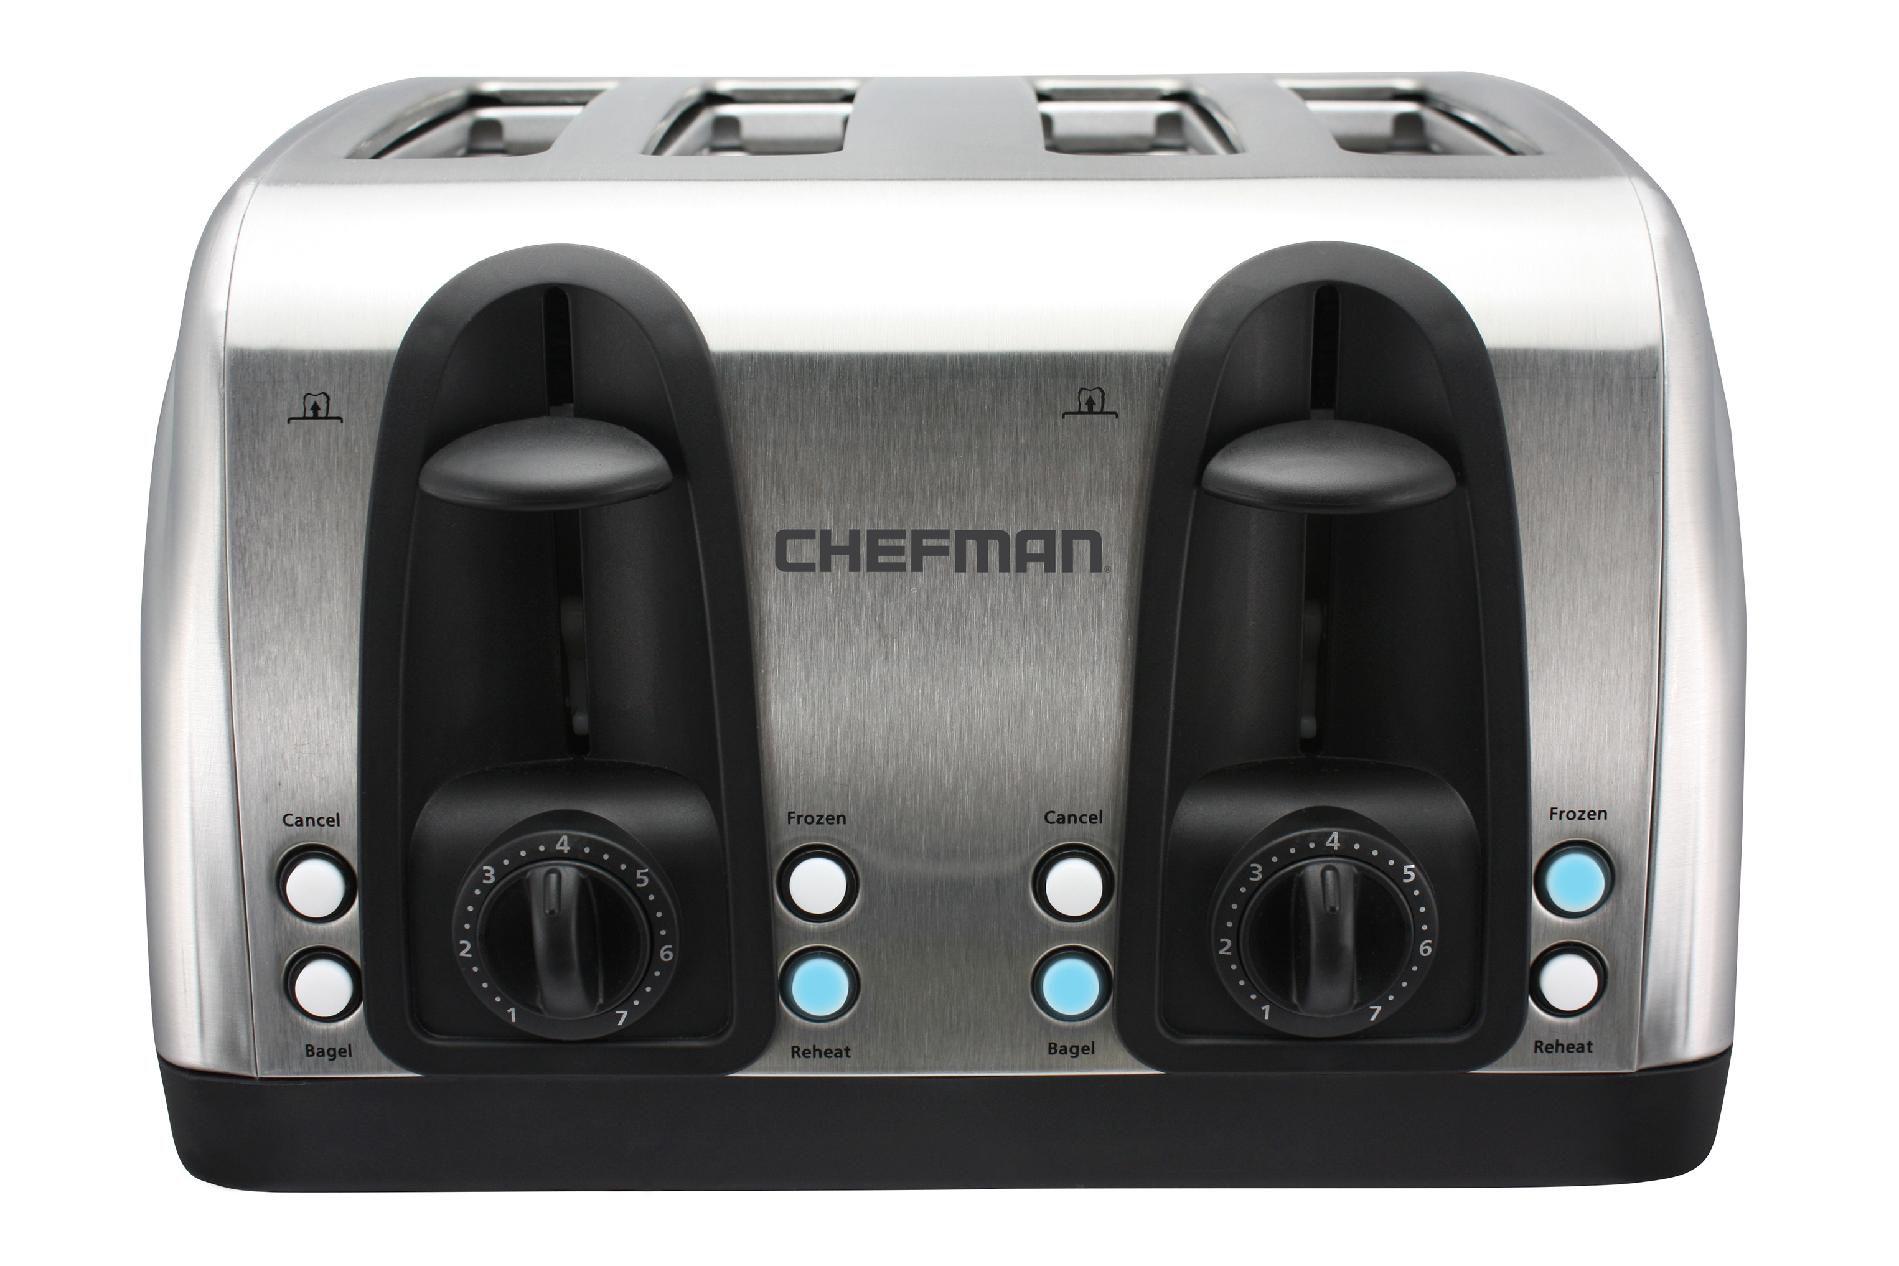 CHEFMAN Chefman 4-Slice Stainless Steel Toaster